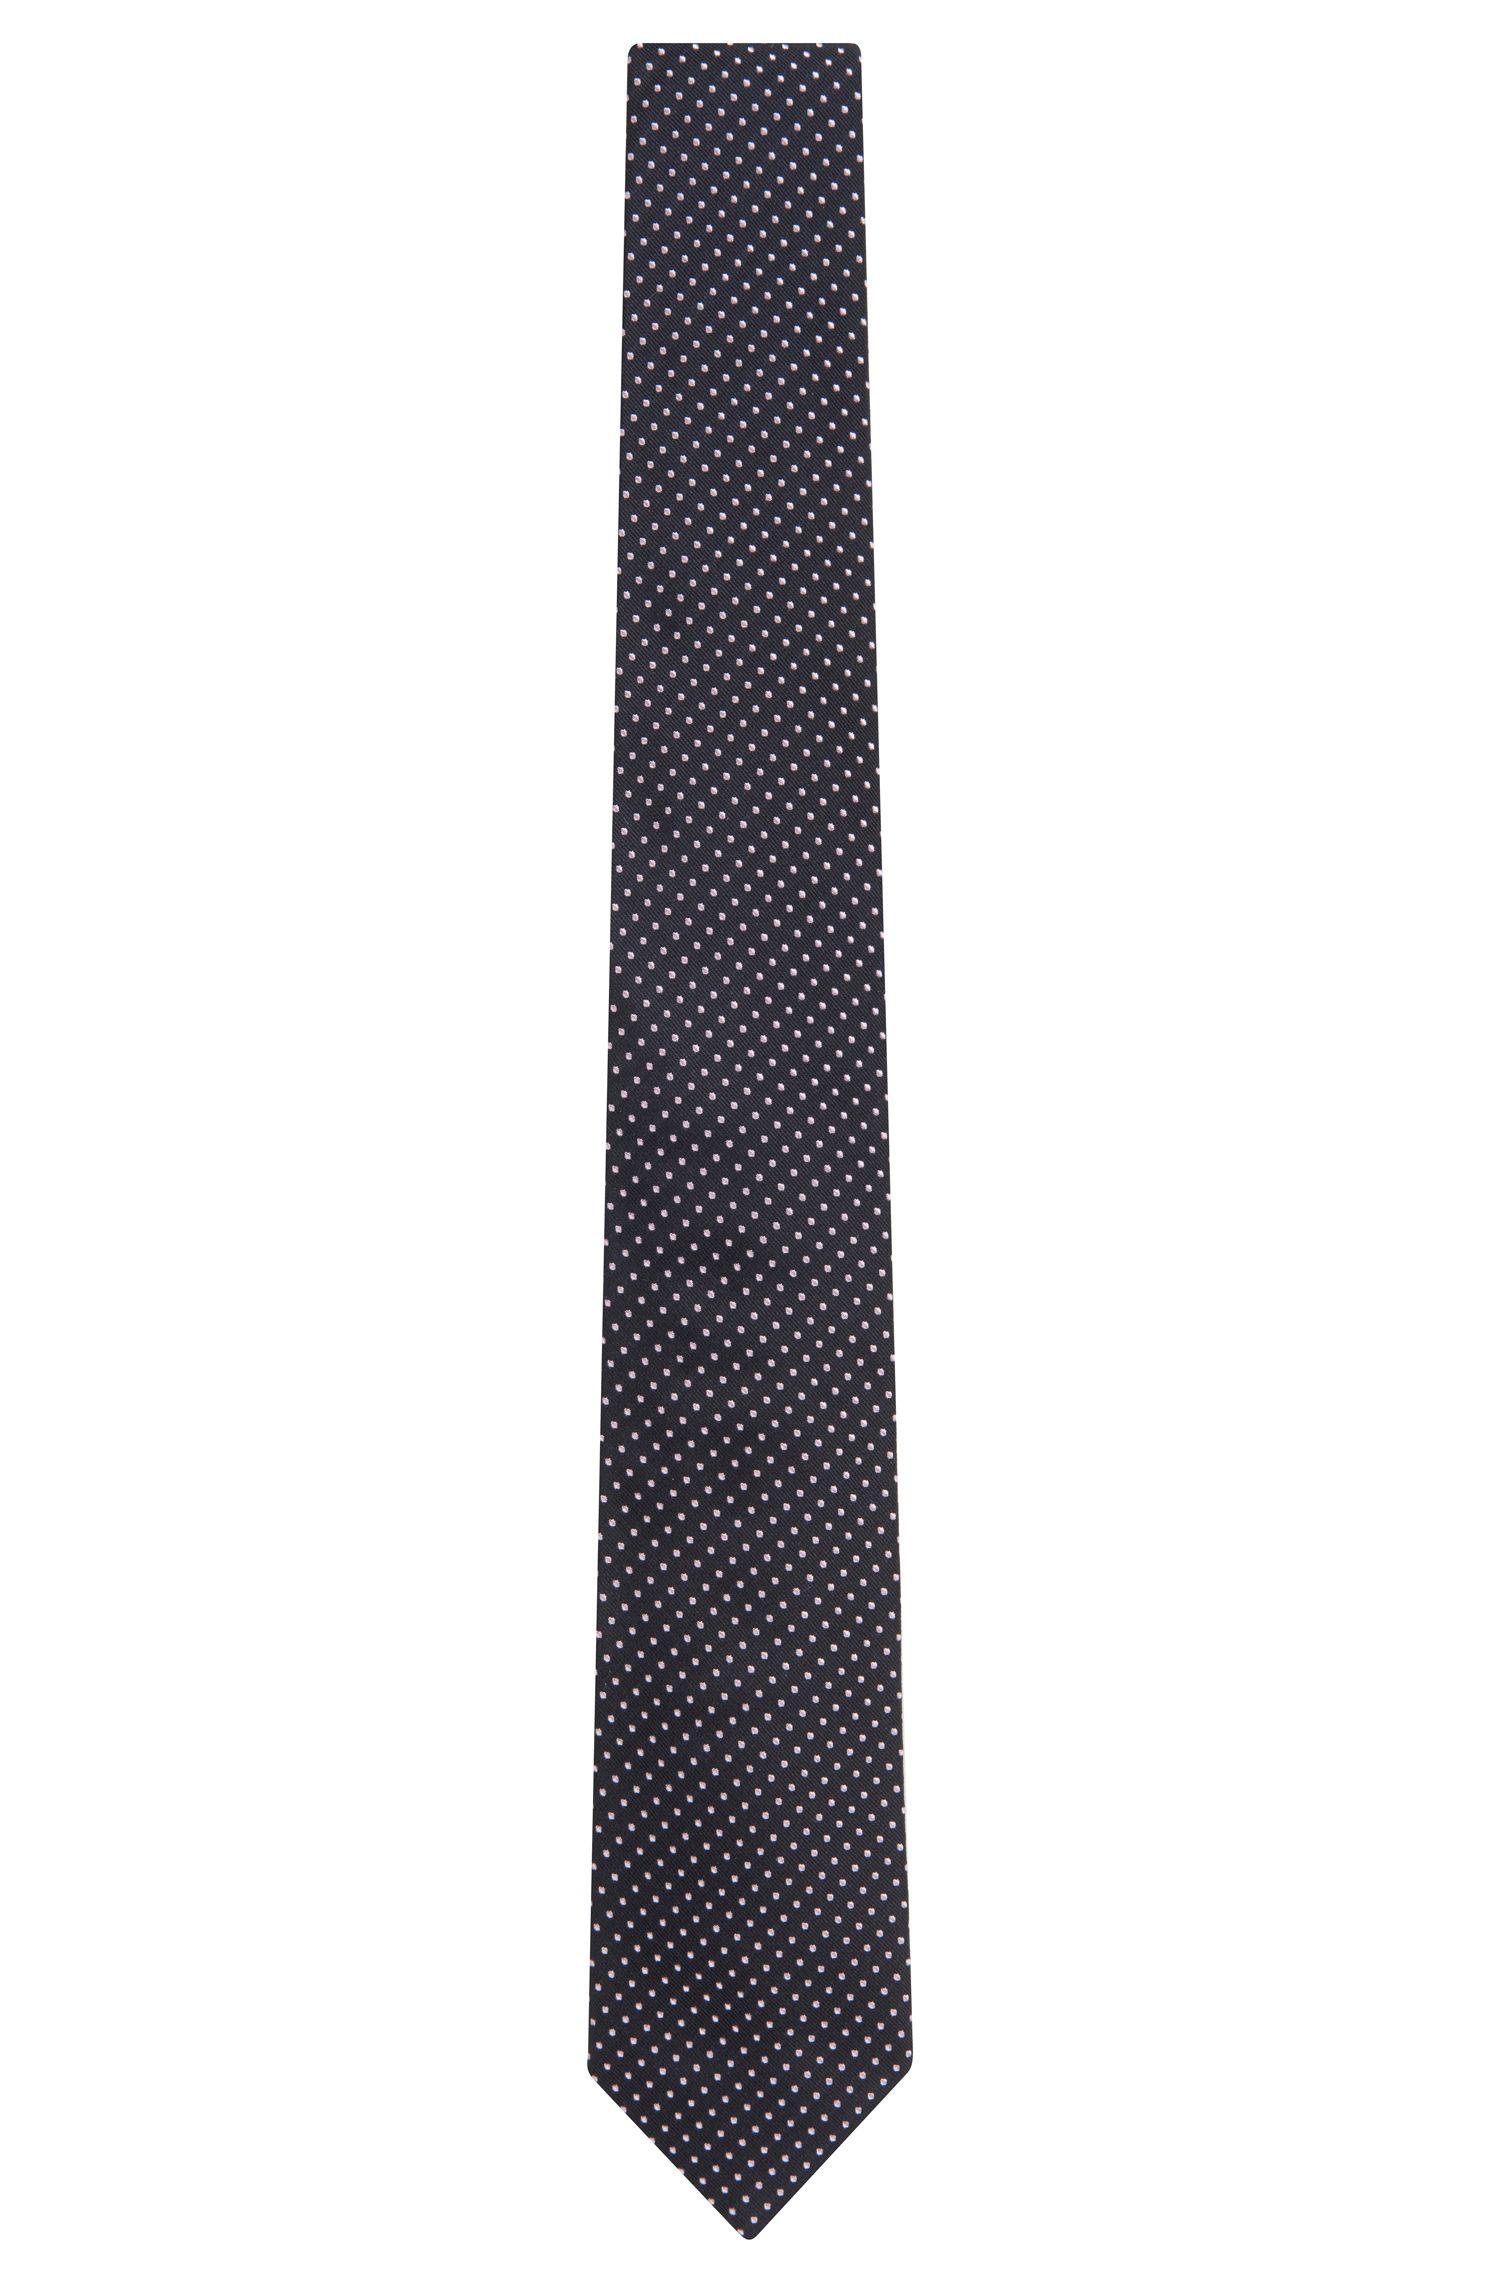 Dotted Italian Silk Tie